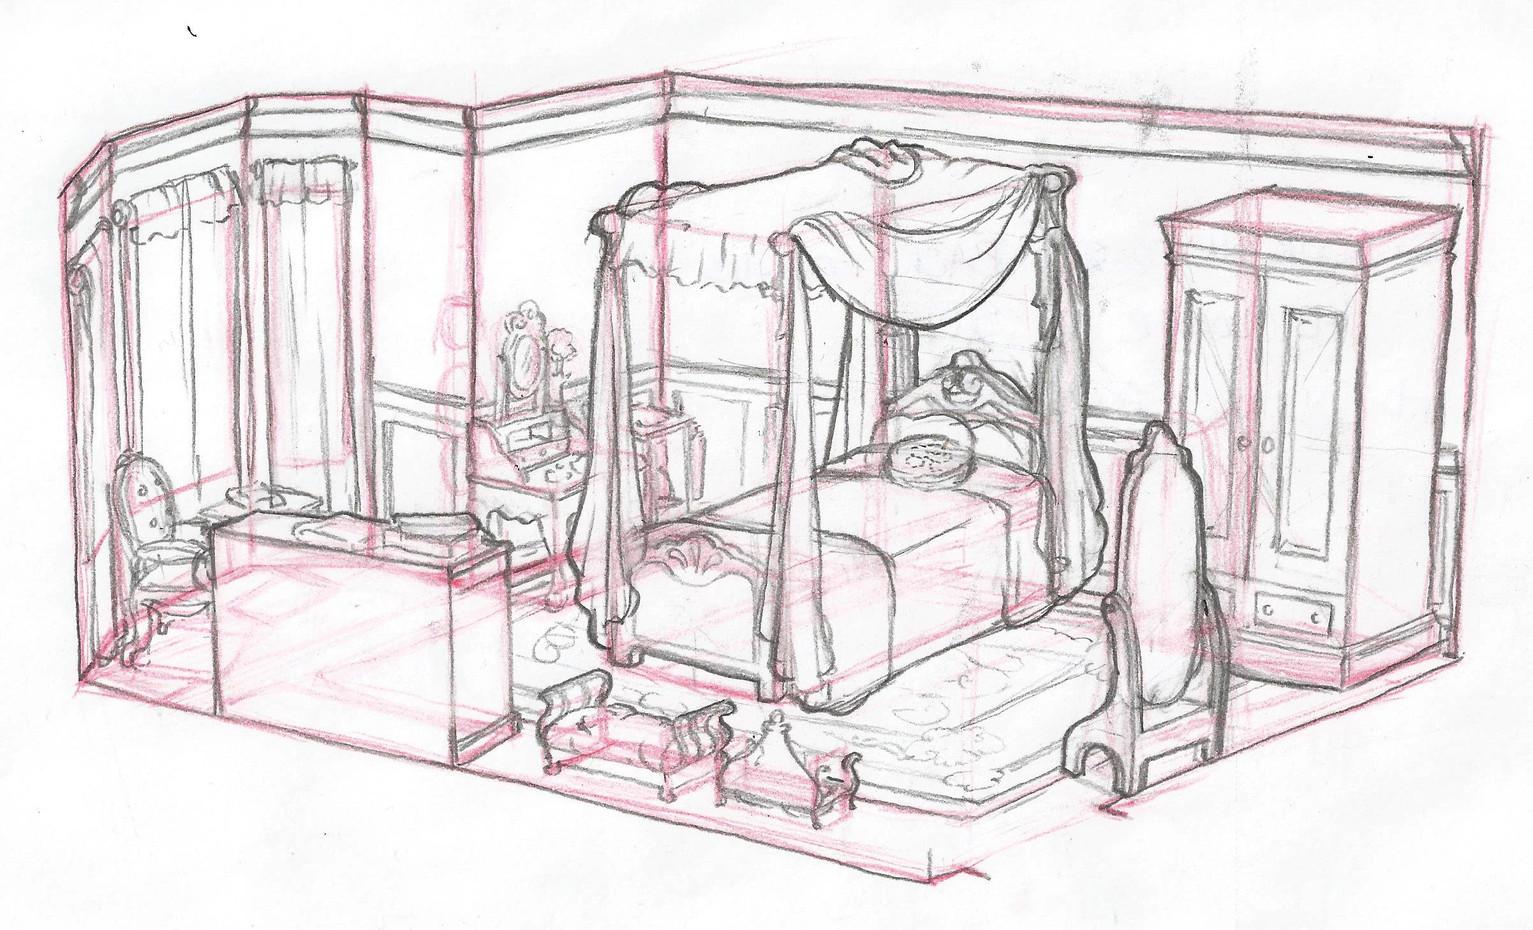 Dorthy's Room